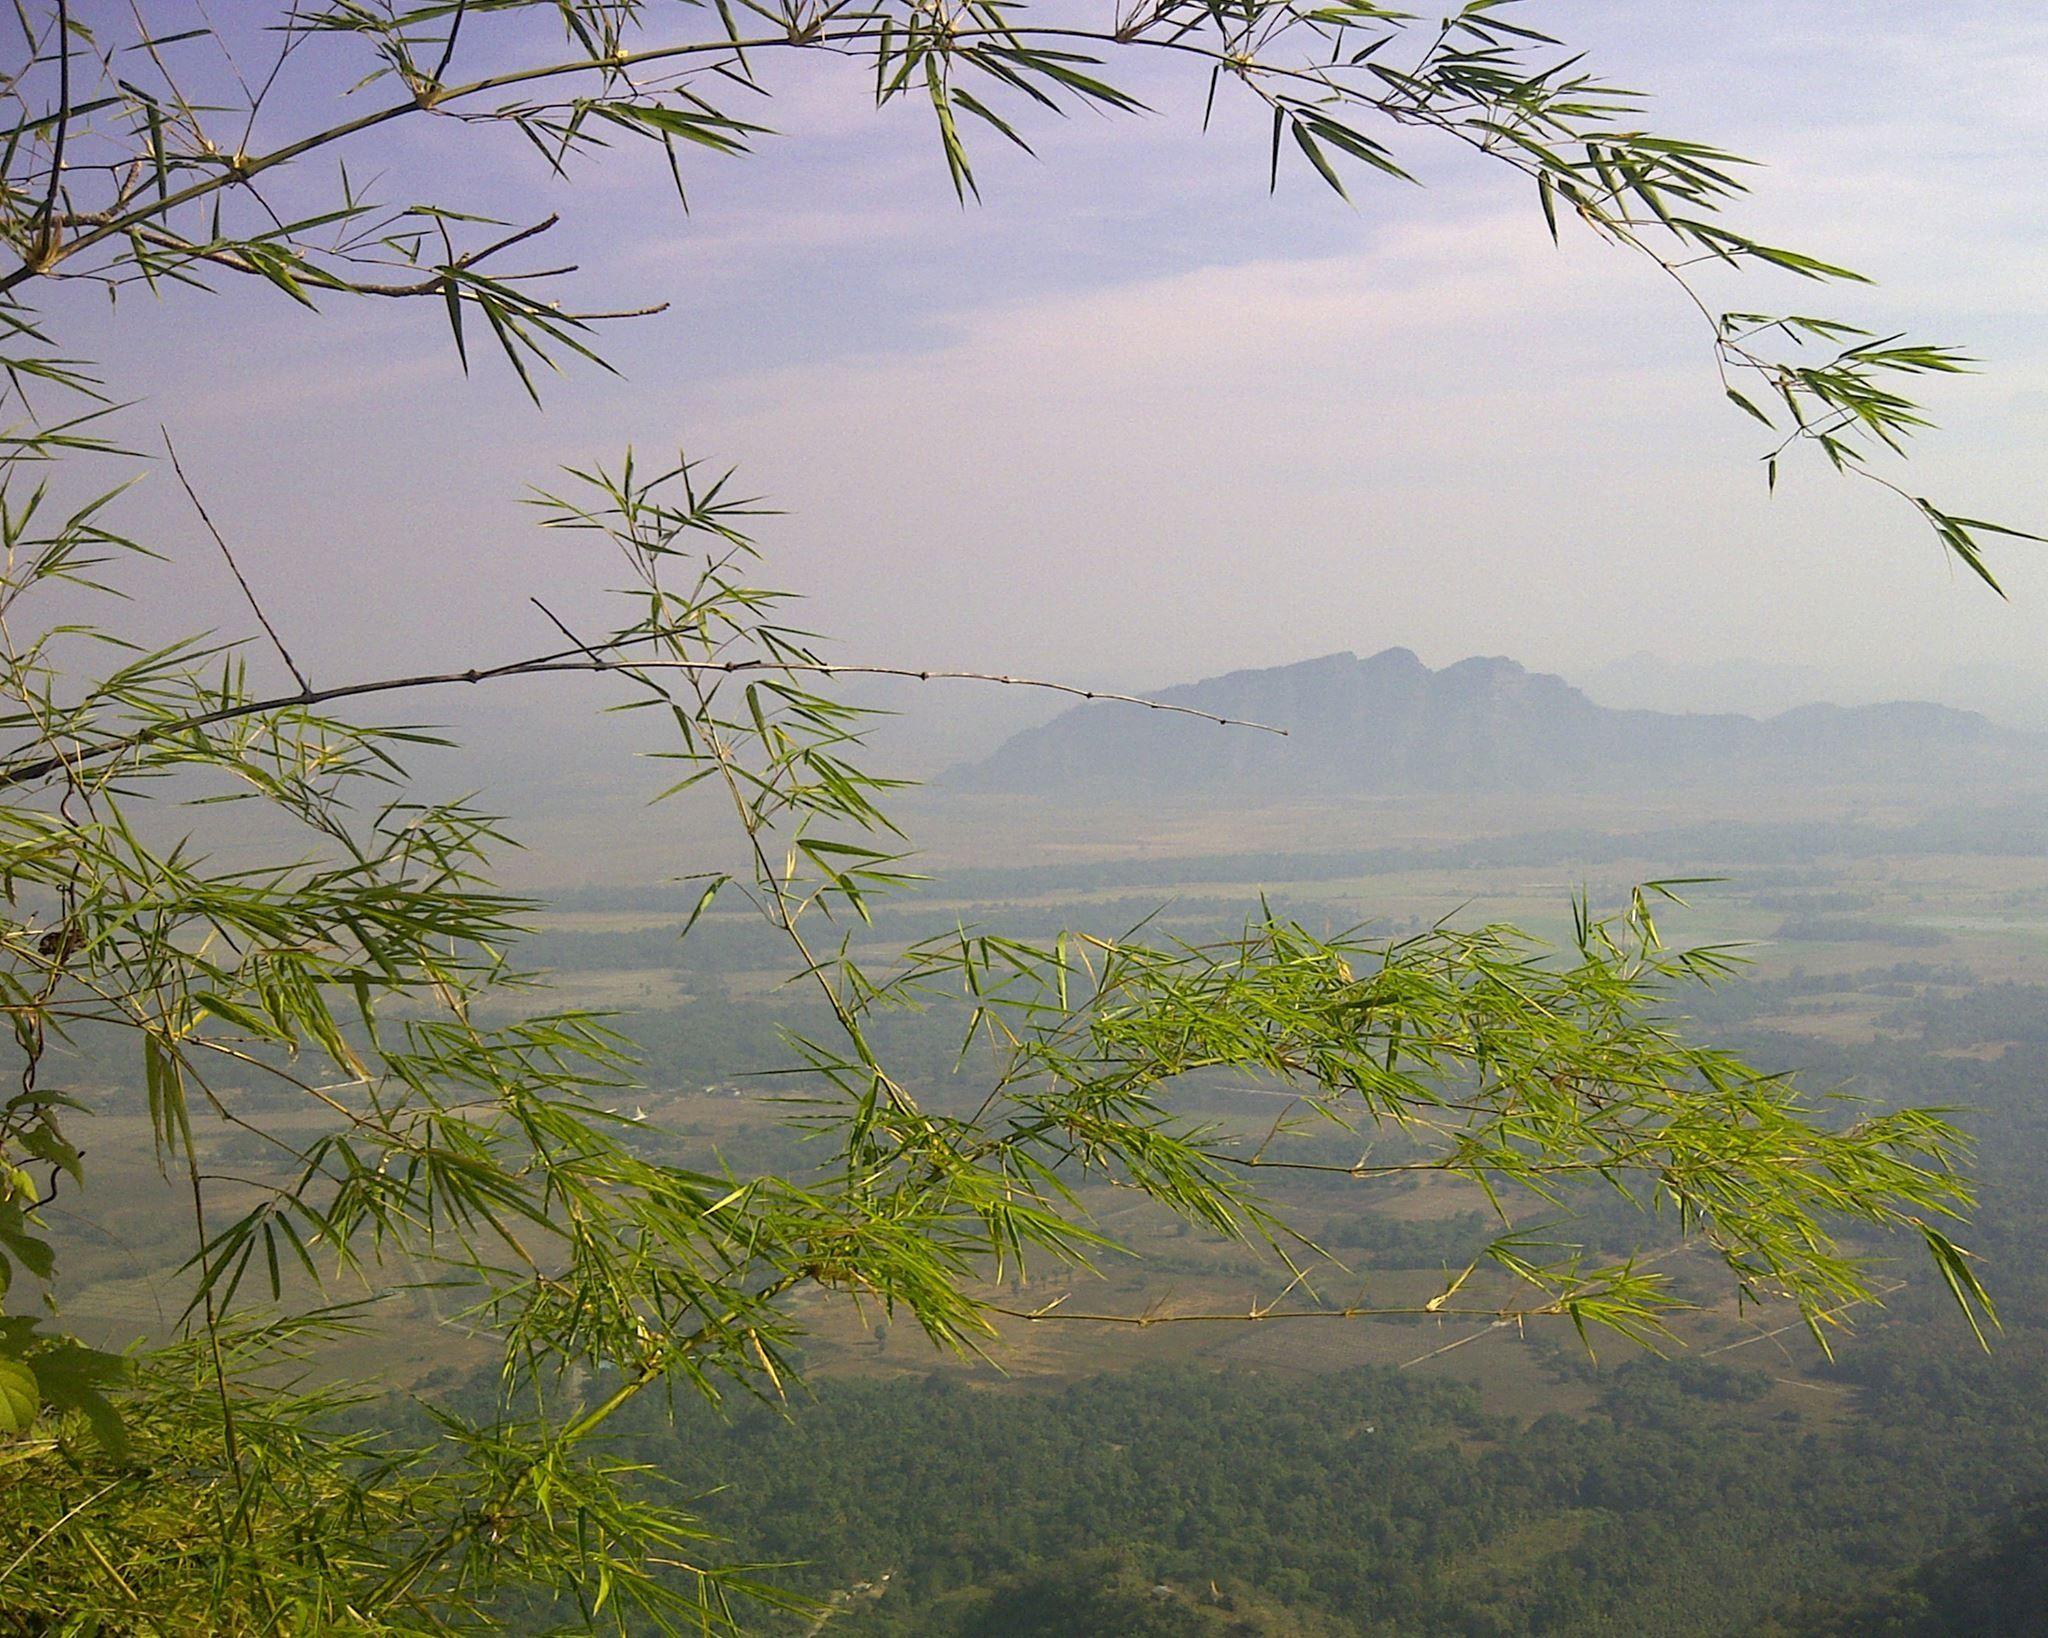 Hpa-an,Karan State,Myanmar.